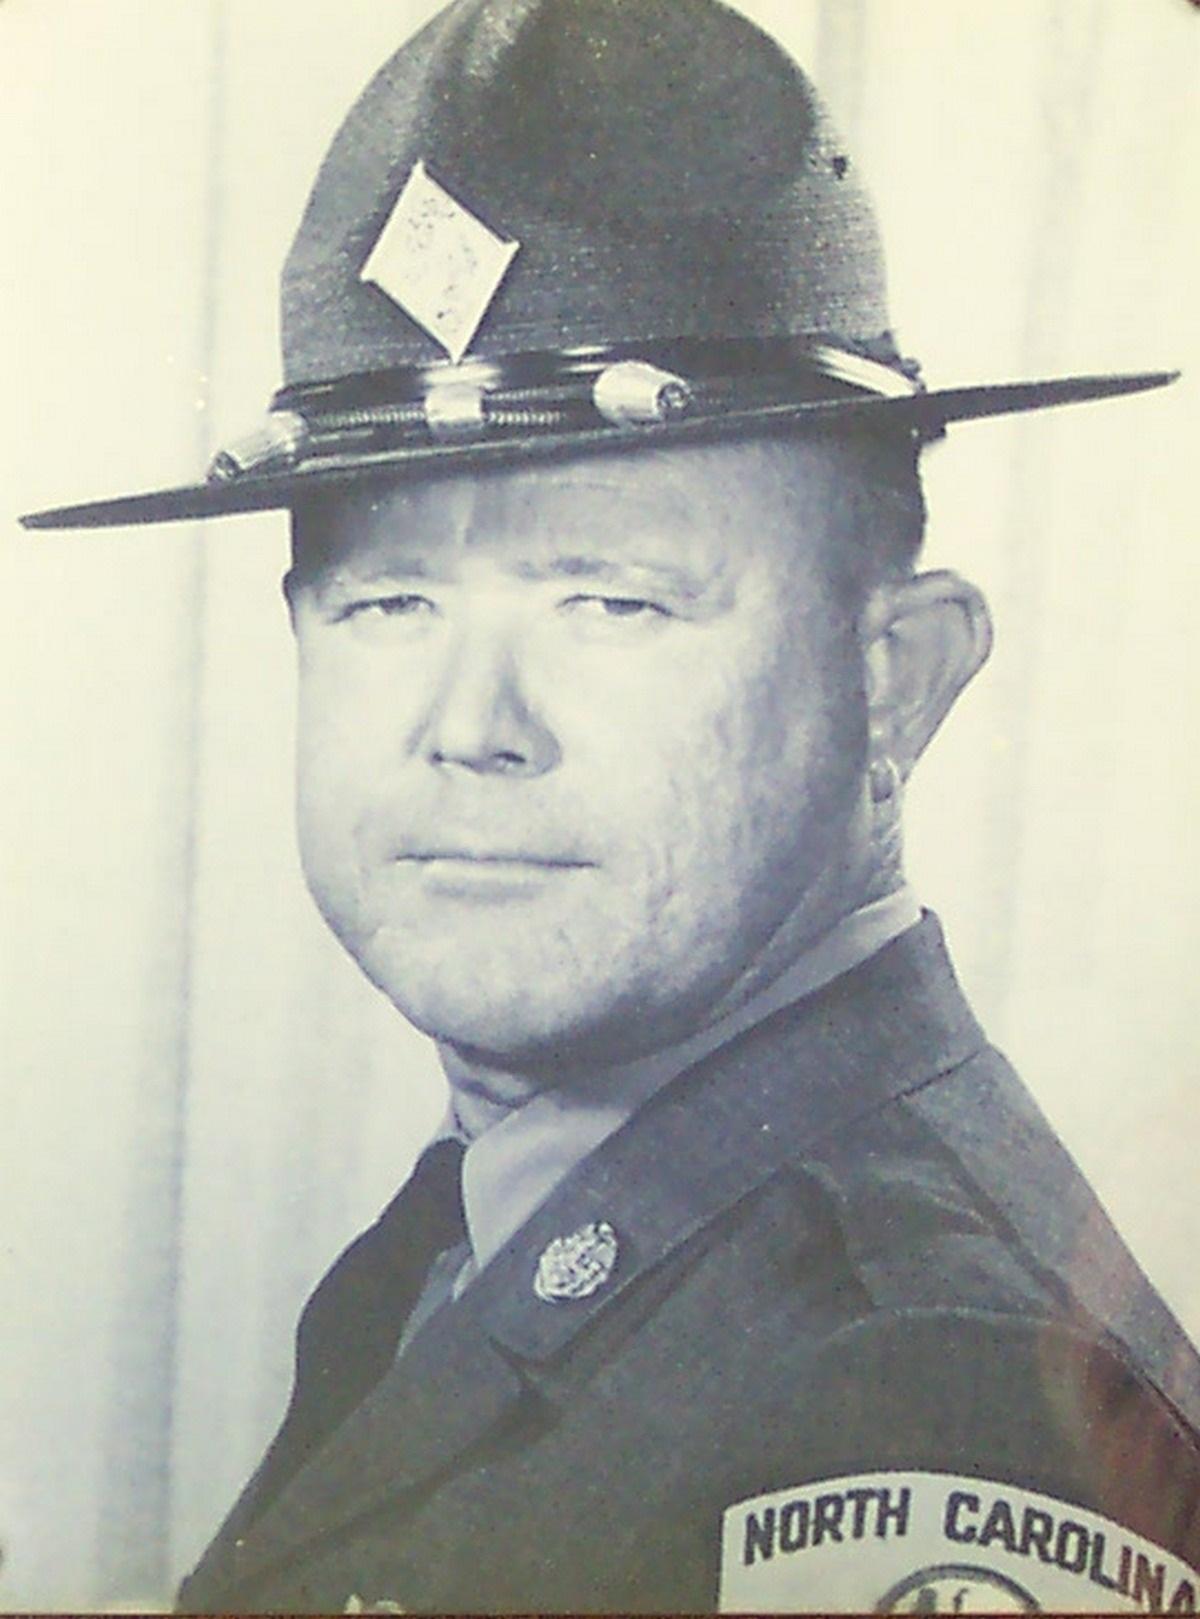 Patrolman Guy Thomas Davis, Jr. | North Carolina Highway Patrol, North Carolina